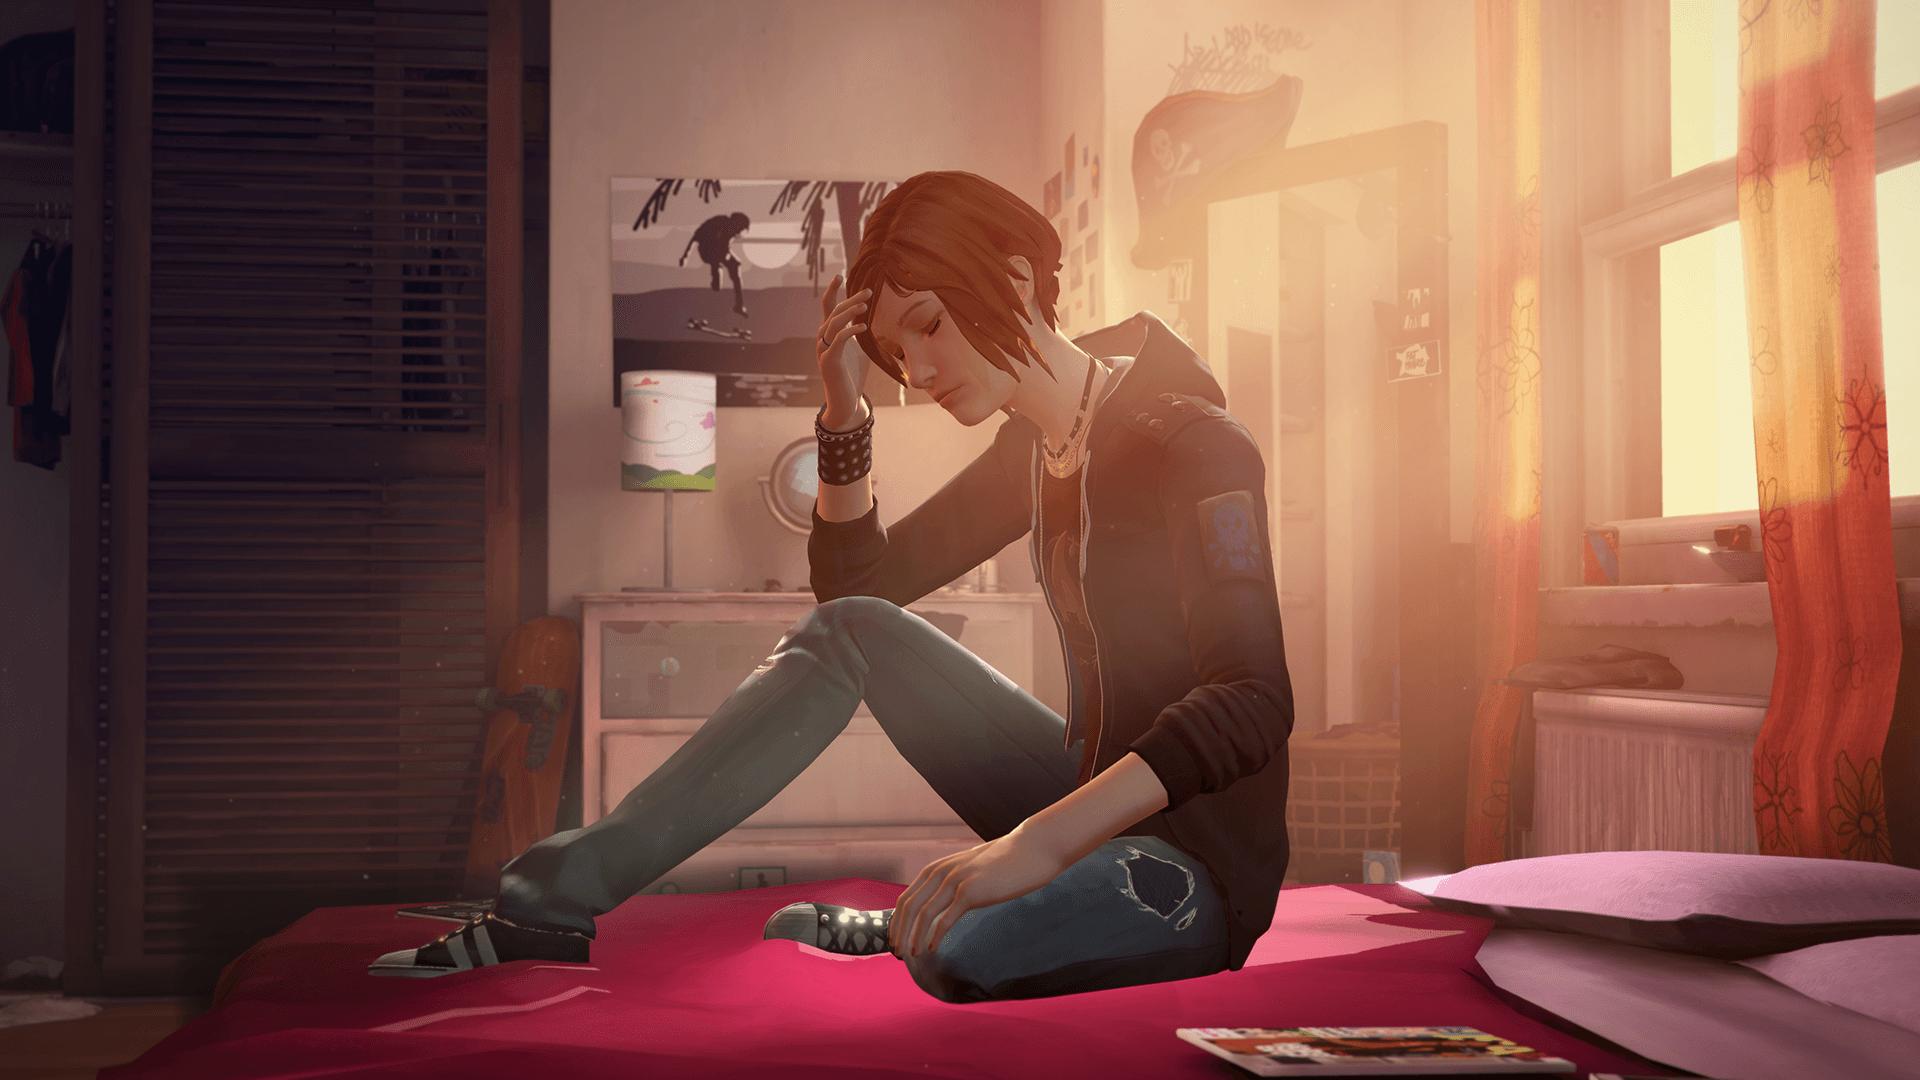 Chloe in room